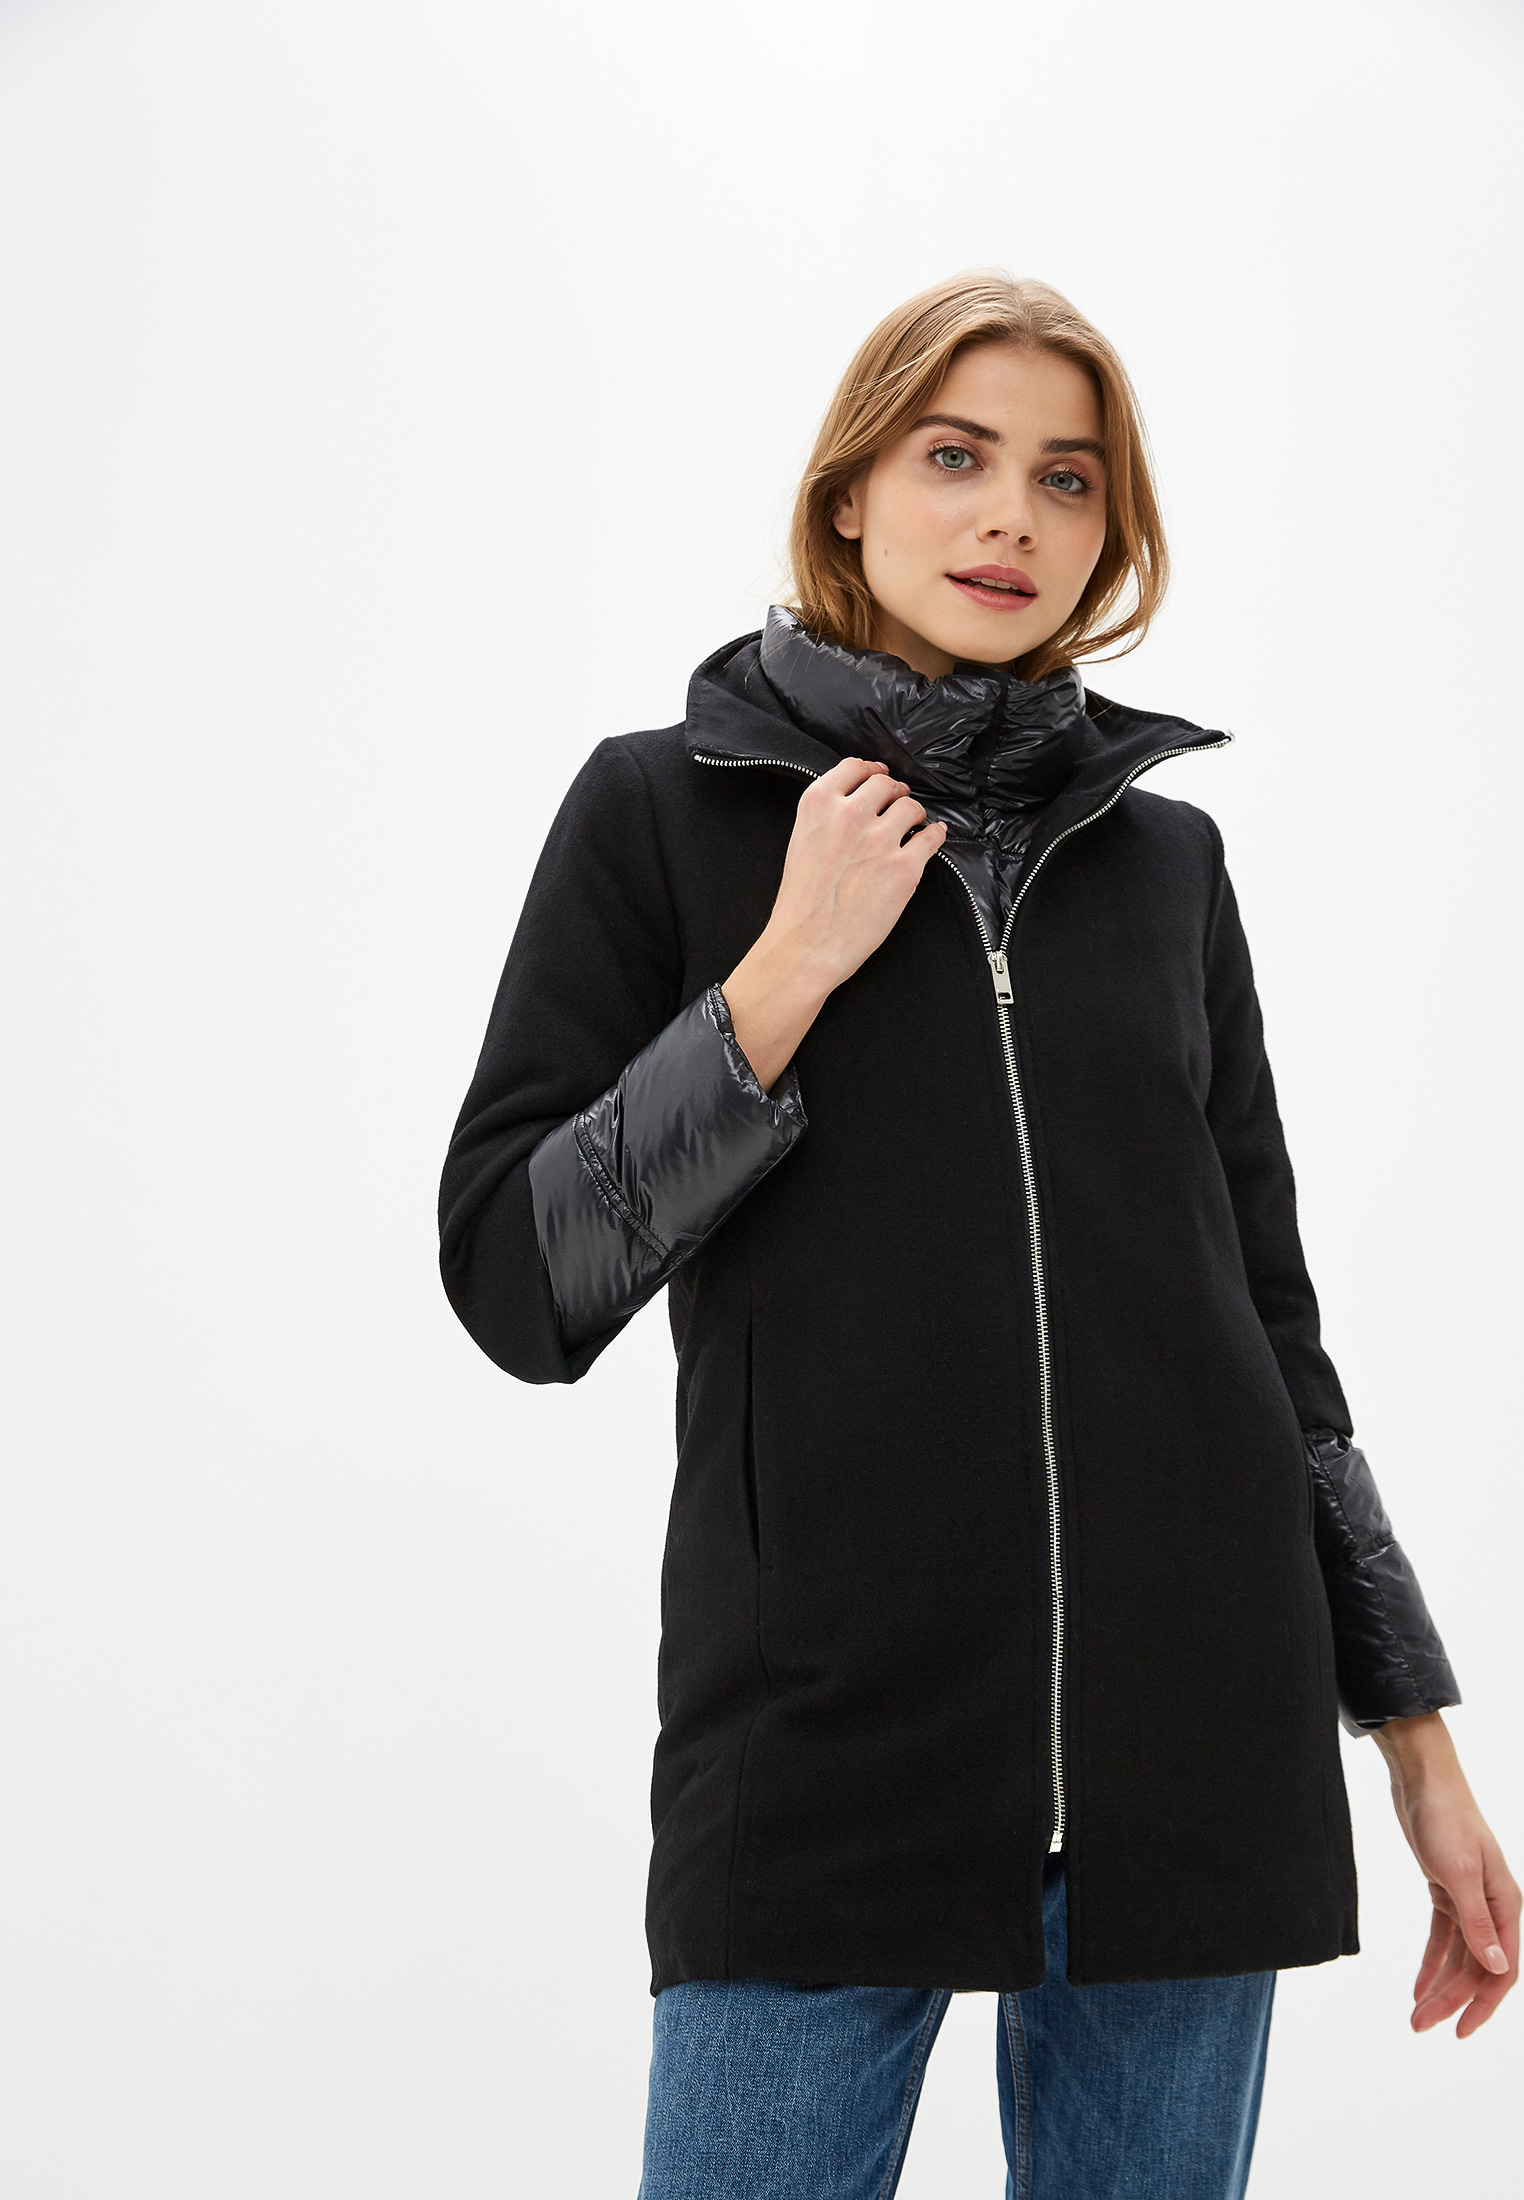 Пуховик, Savage, цвет: черный. Артикул: SA004EWGESF4. Одежда / Верхняя одежда / Пуховики и зимние куртки